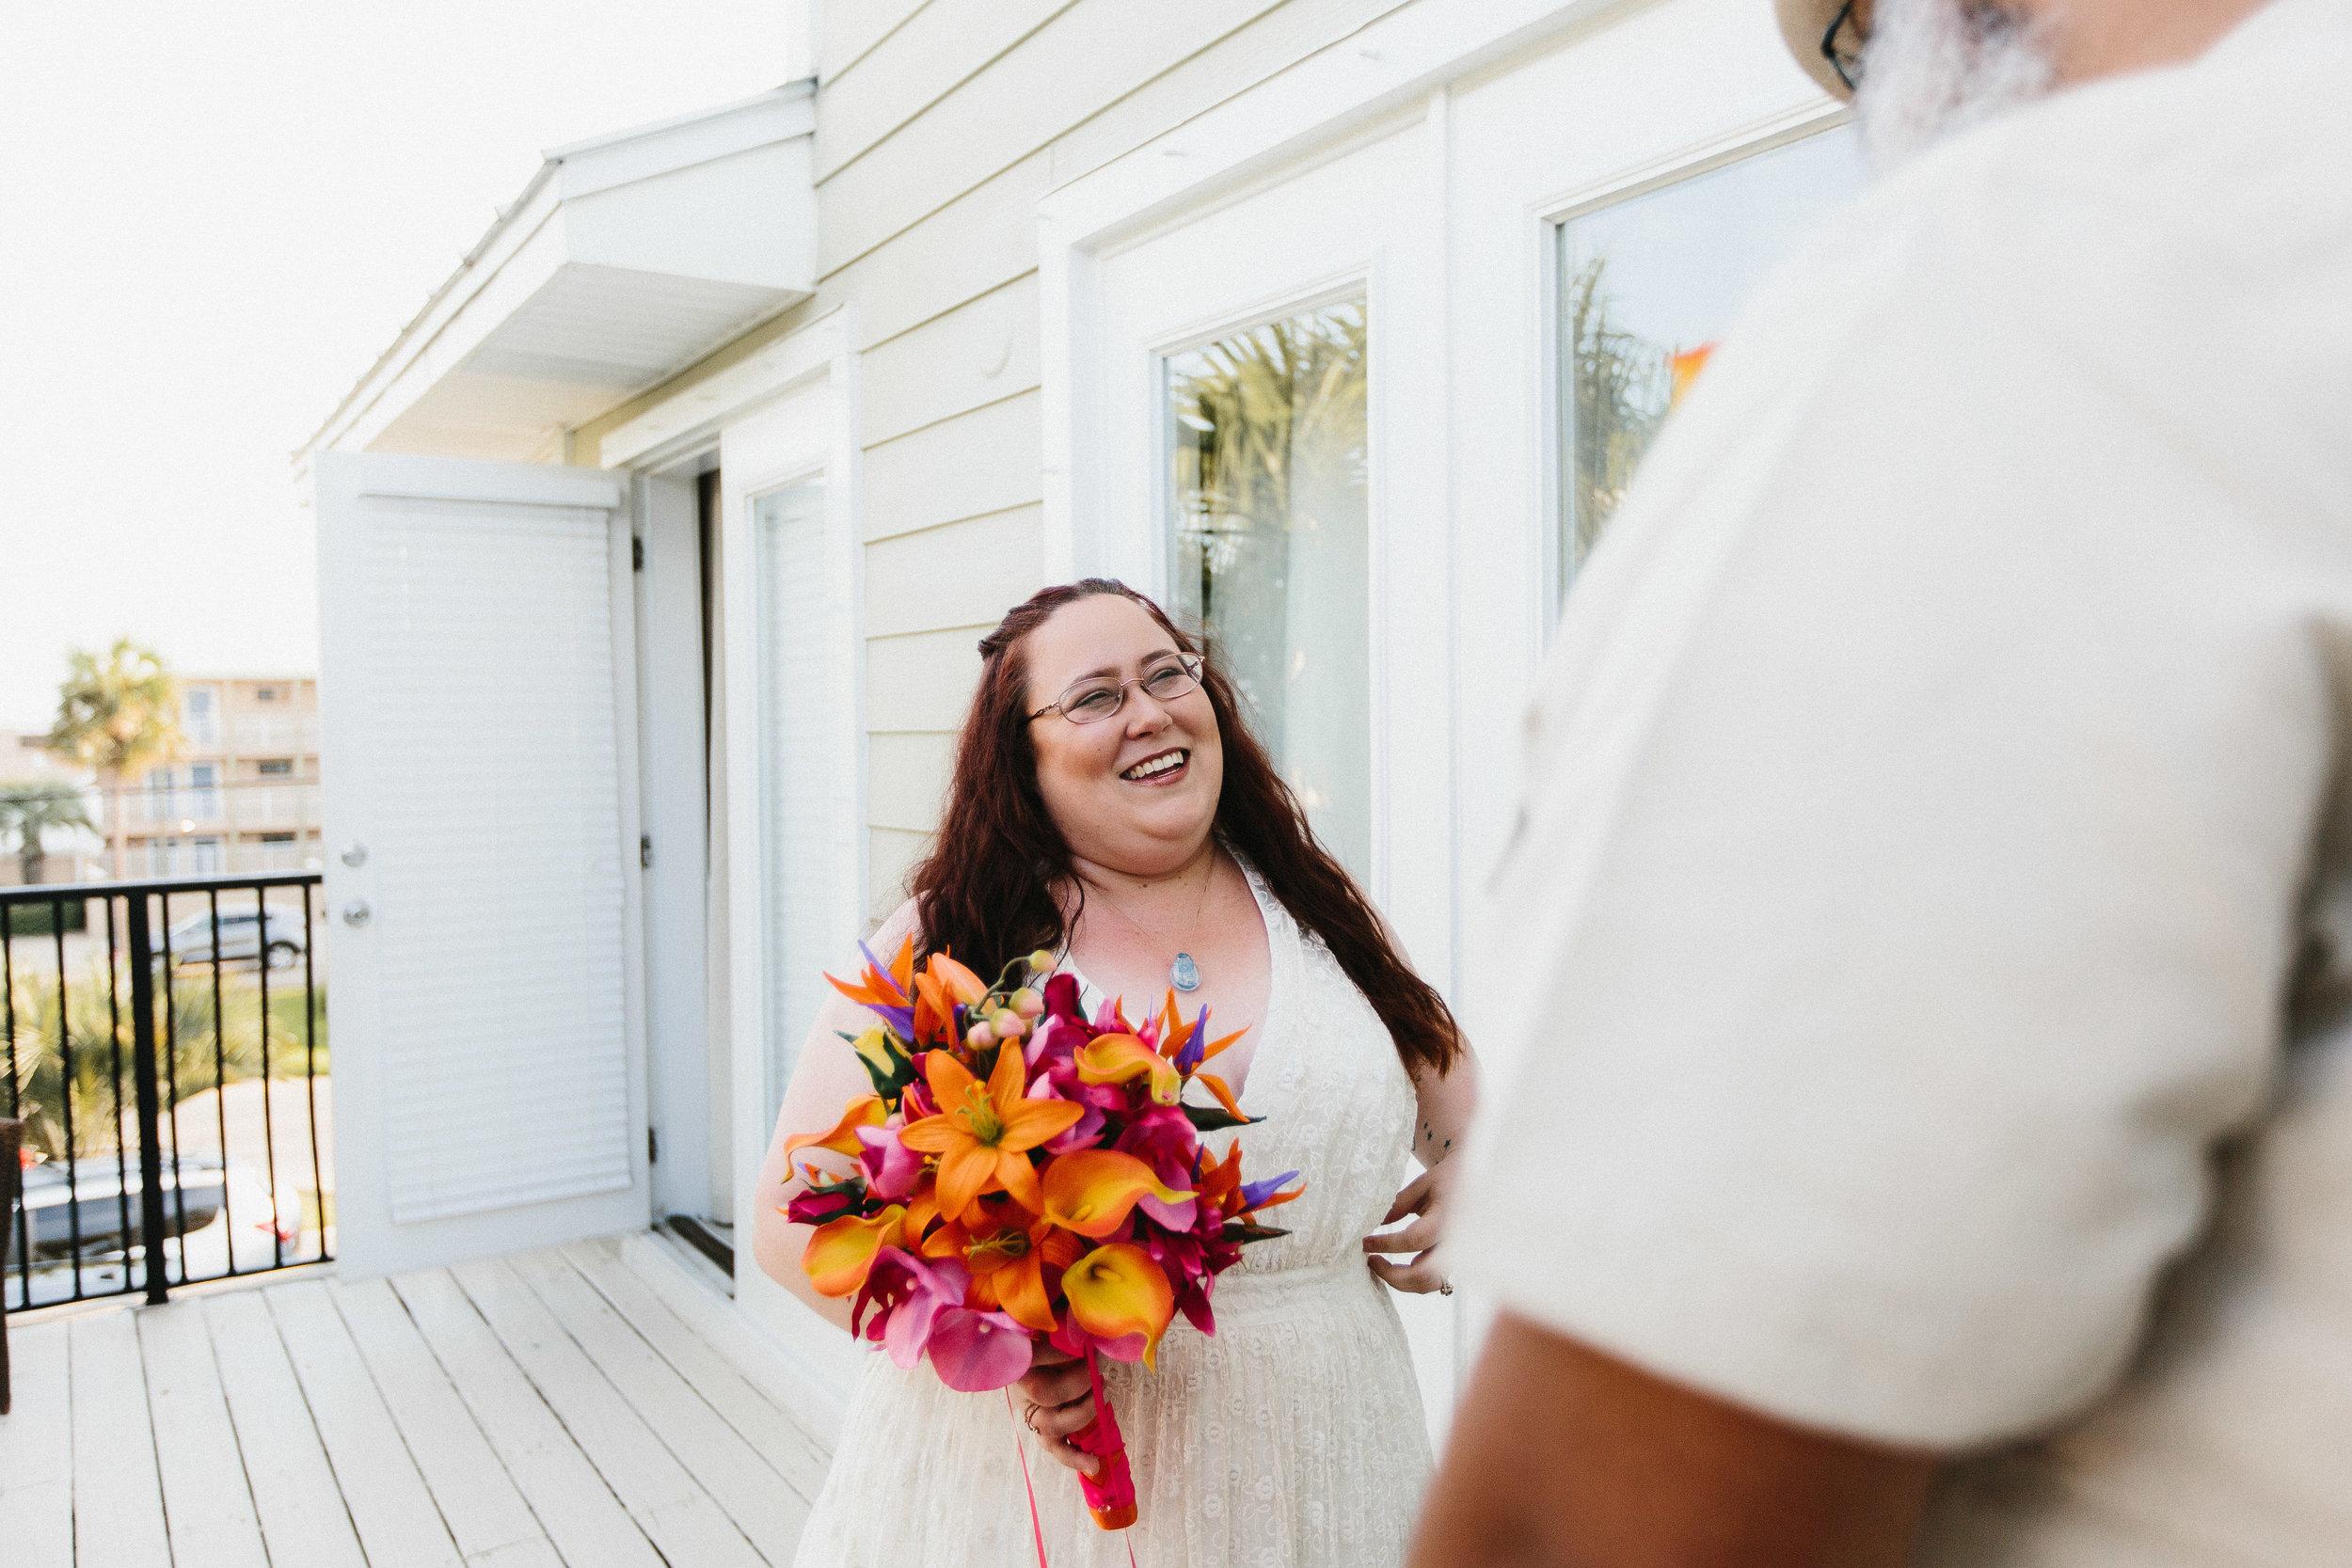 destin_sunset_beach_elopement_intimate_wedding_photographer_florida_documentary_1061.jpg